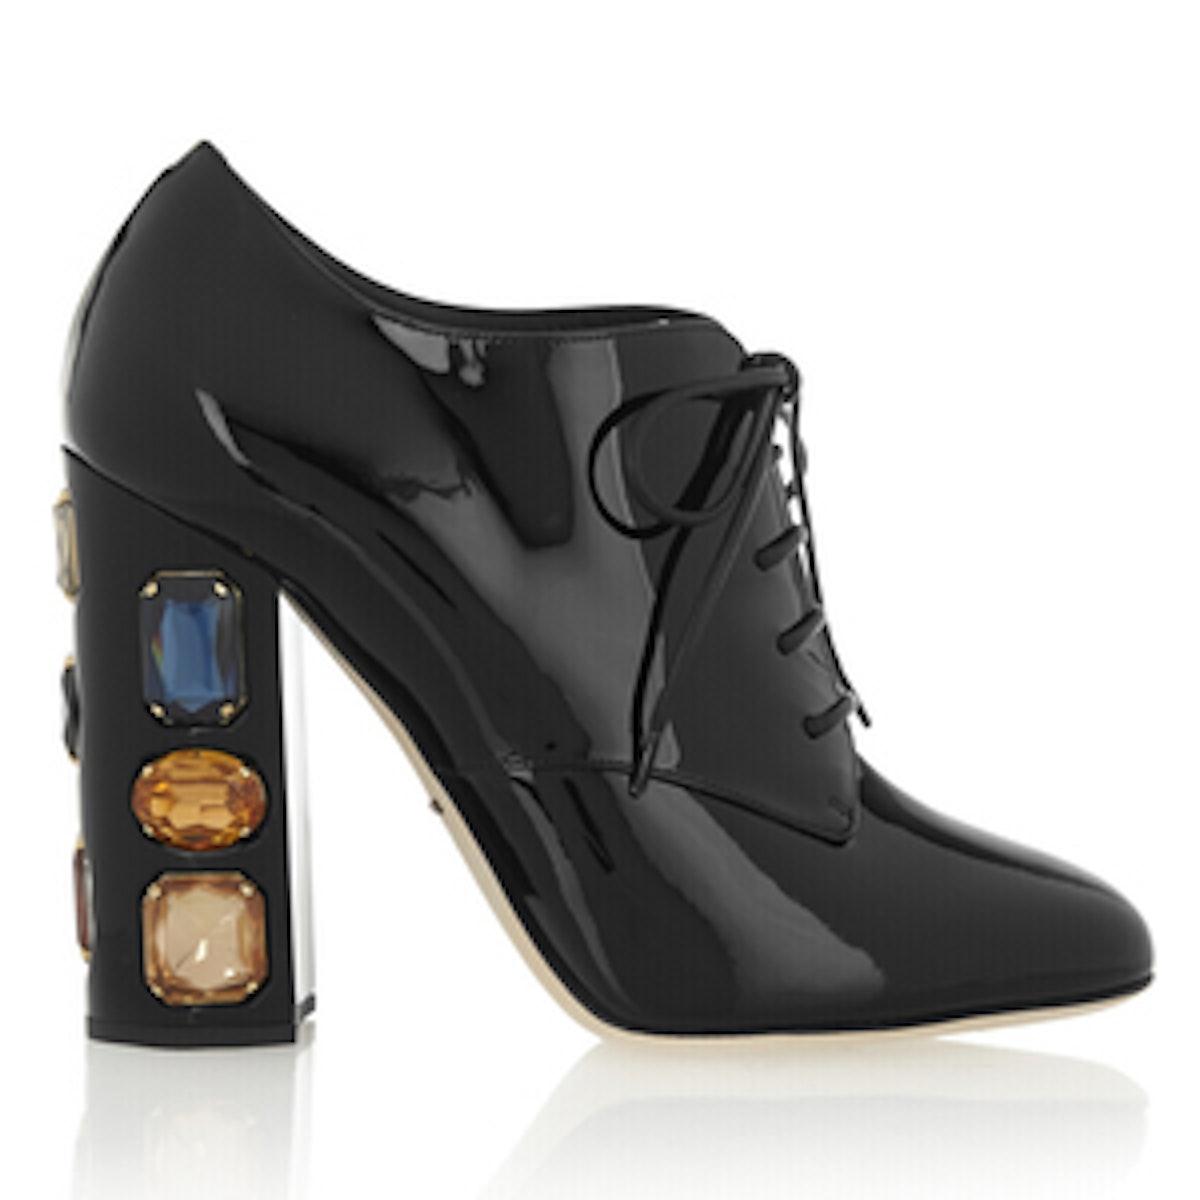 Swarovski Embellished Leather Ankle Booties